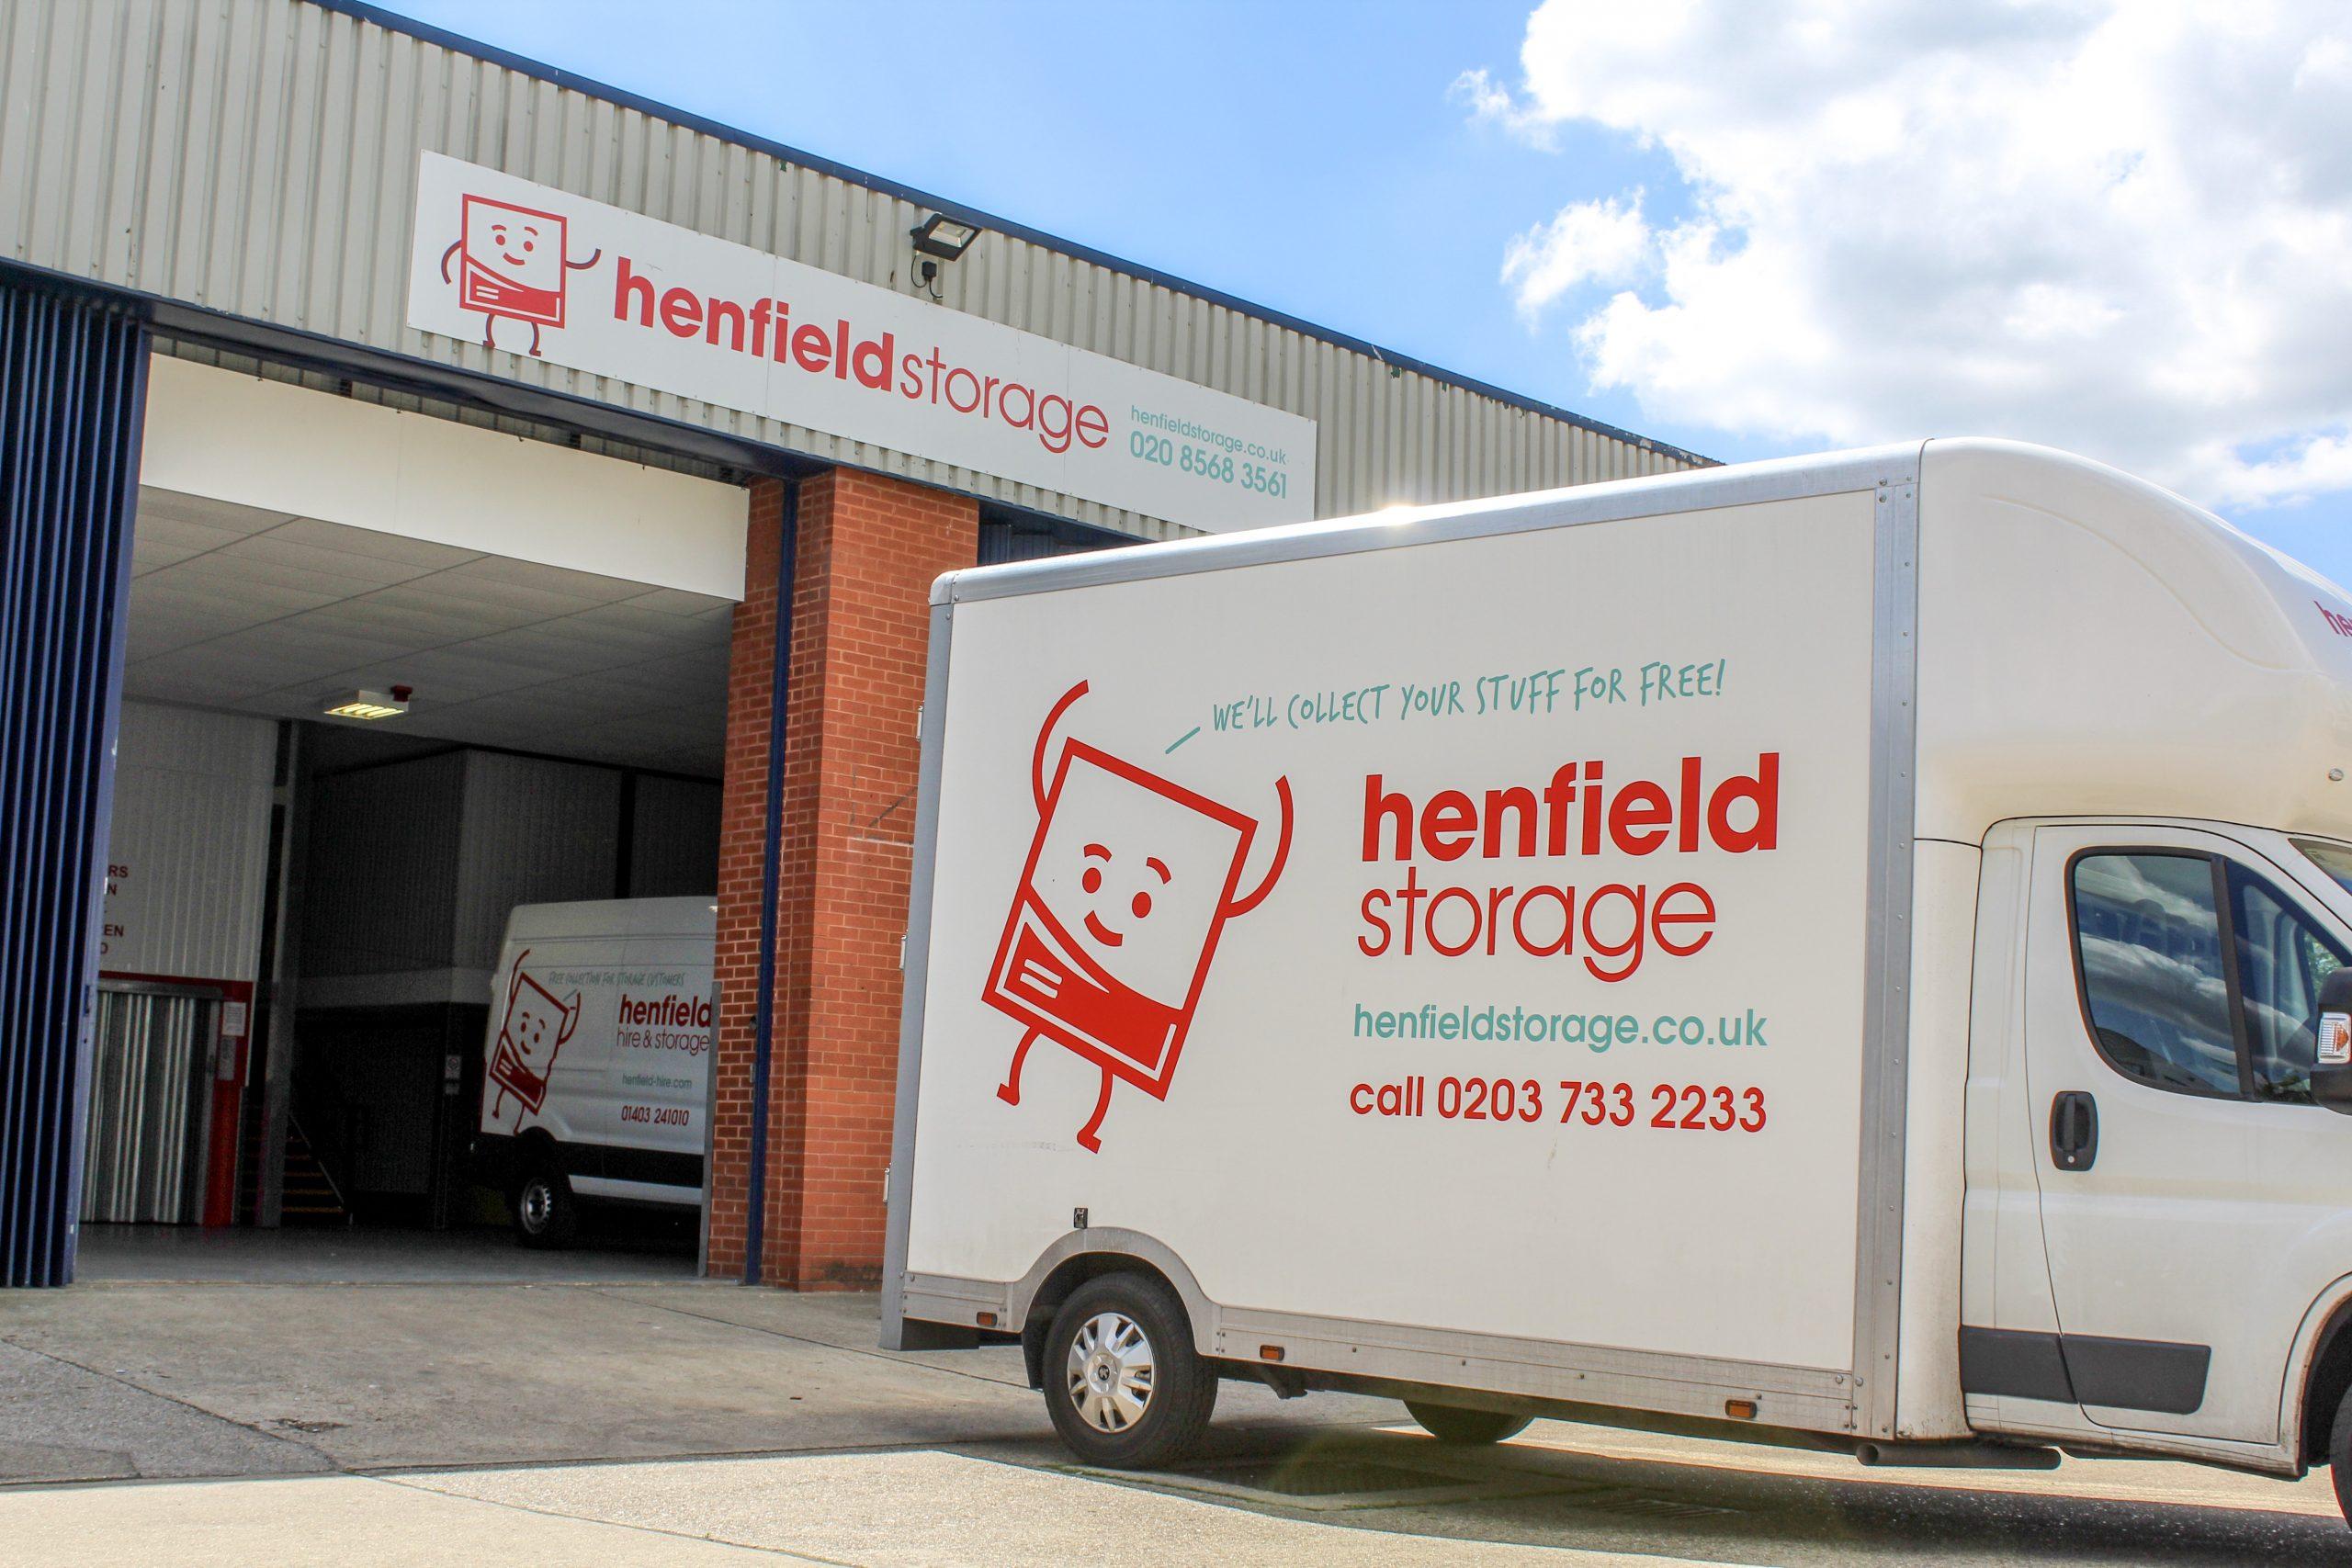 Henfield Storage - Chiswick a storage company in Shield Drive, Brentford, UK